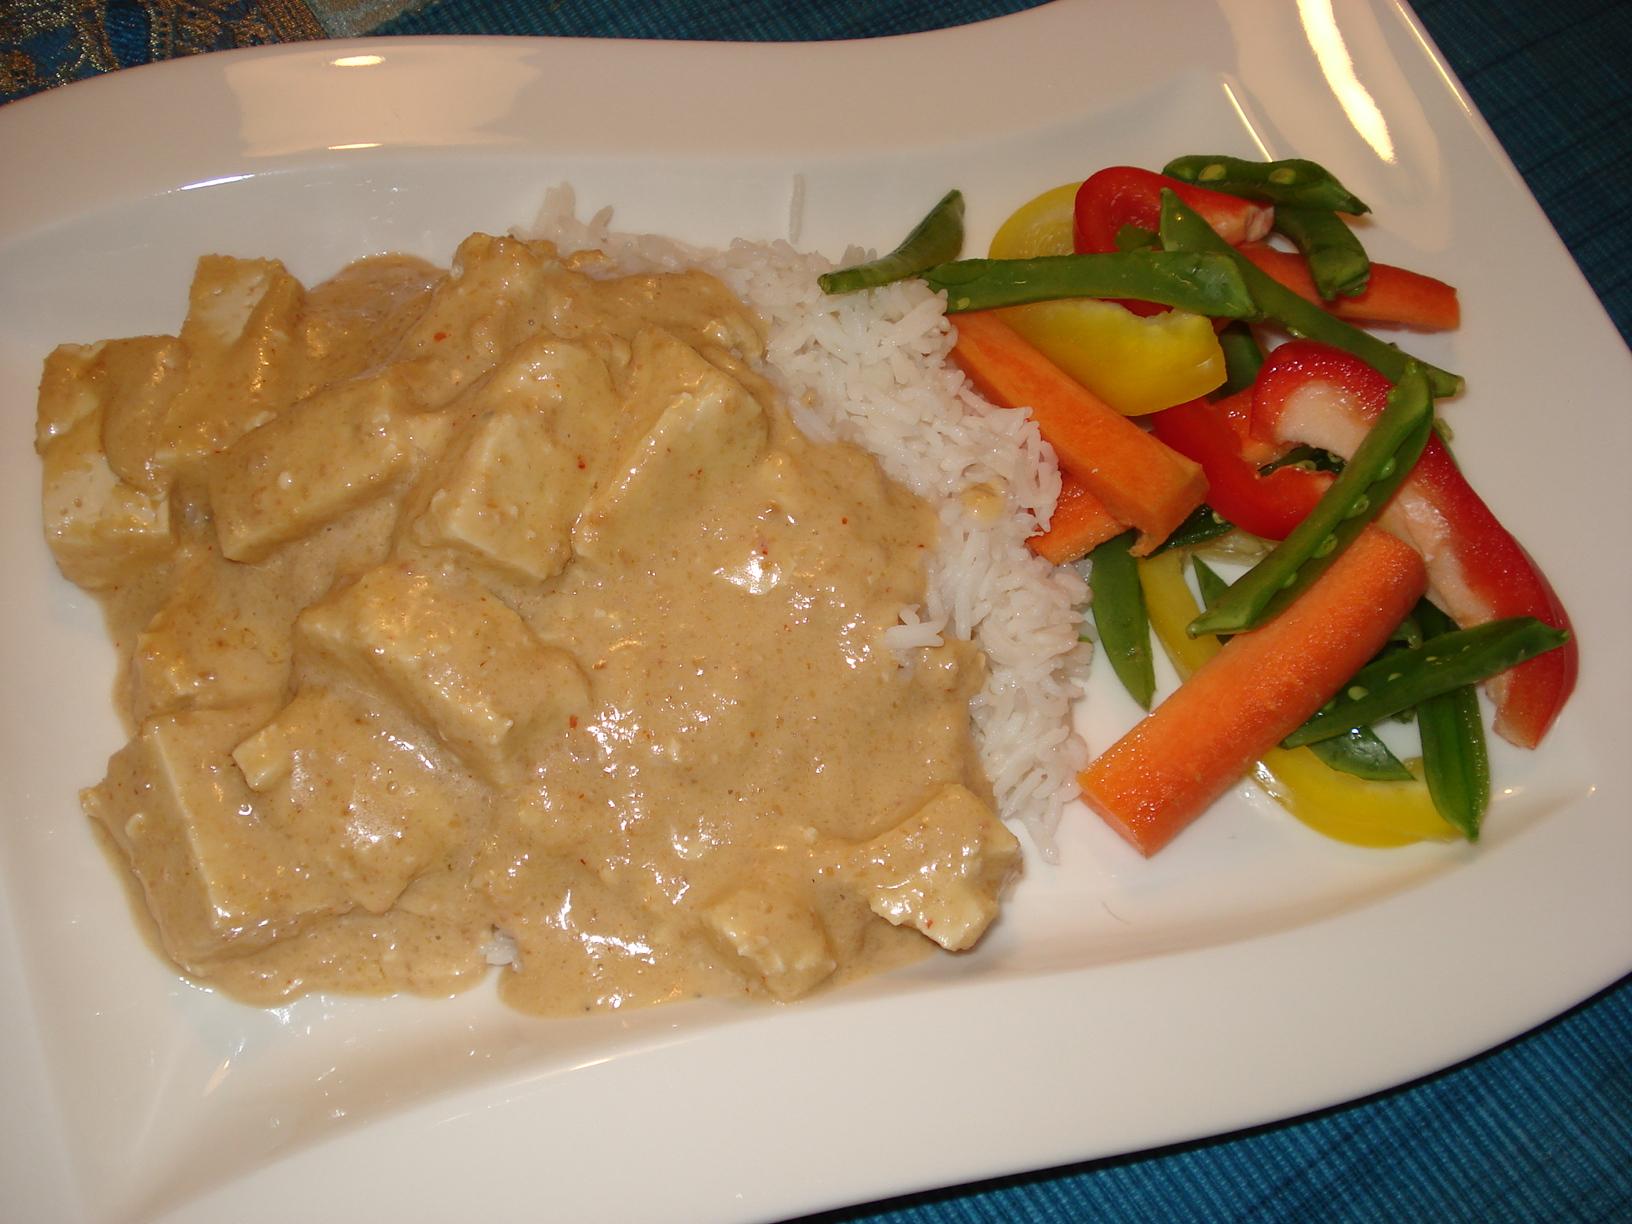 Tofu i jordnötssås